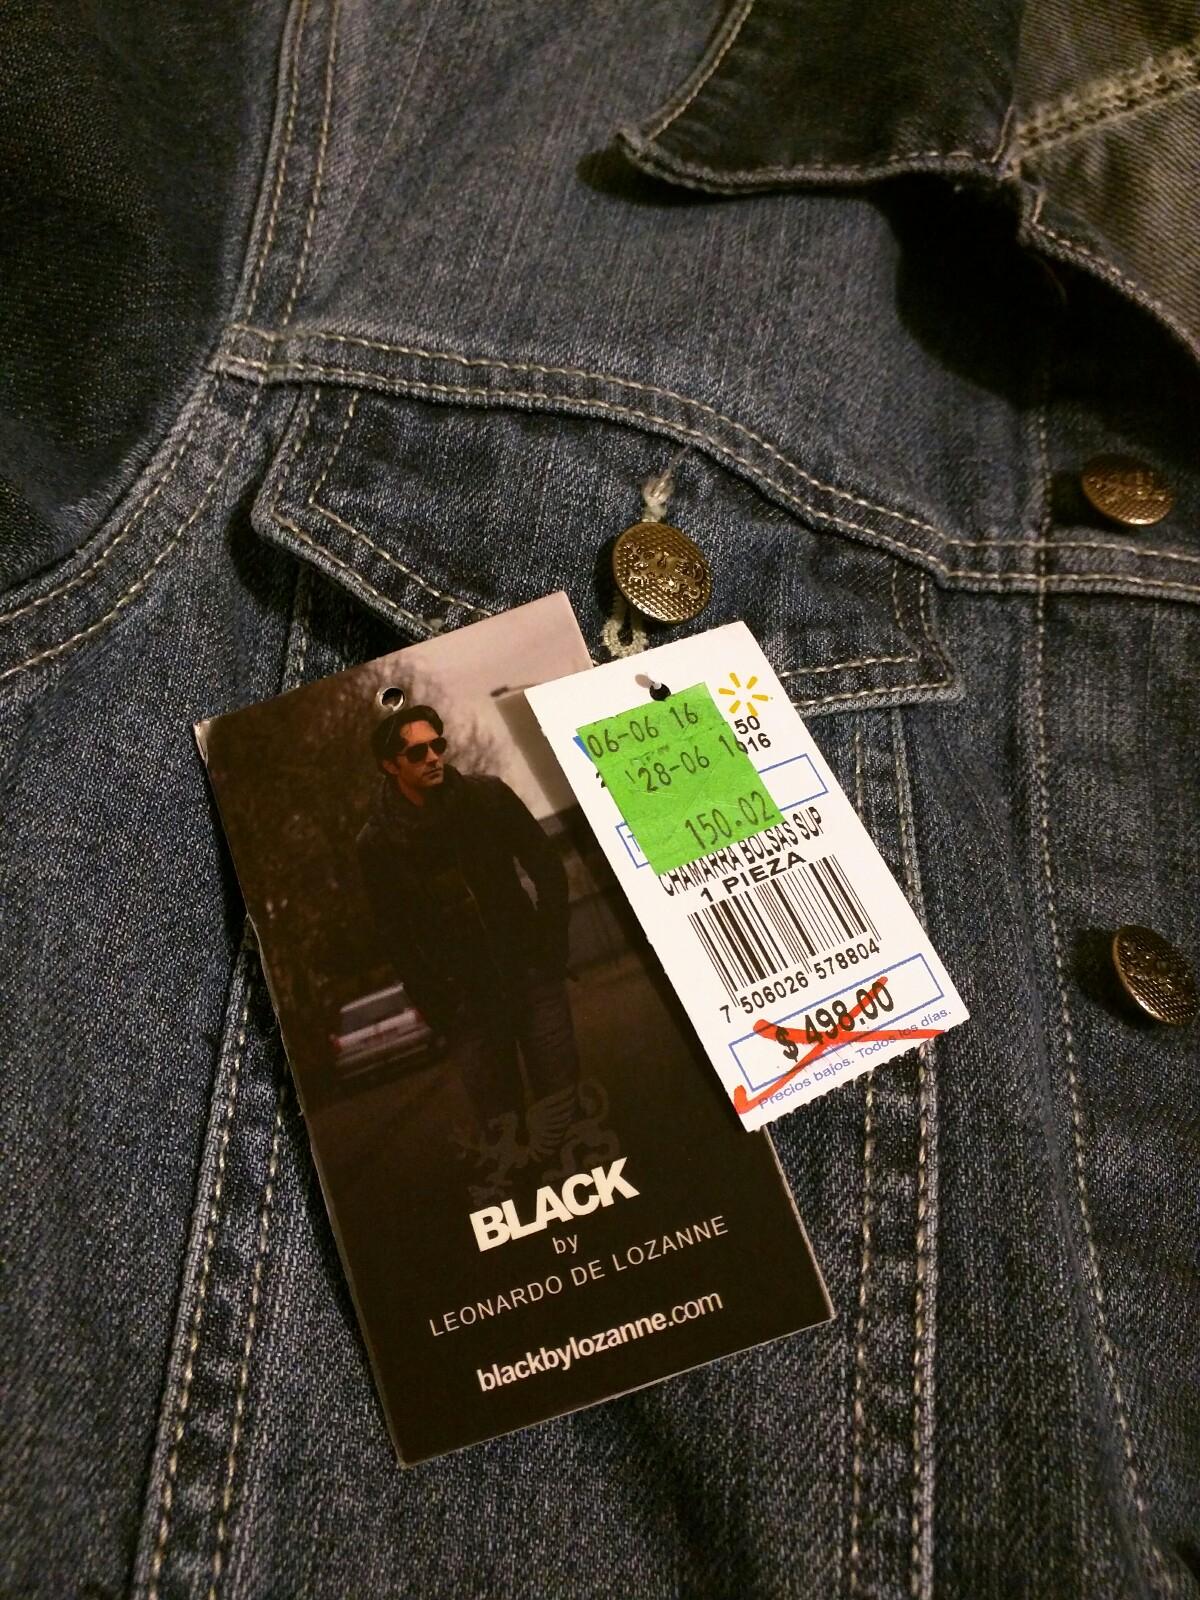 Walmart: Chamarra de mezclilla Black by Leonardo De Lozanne